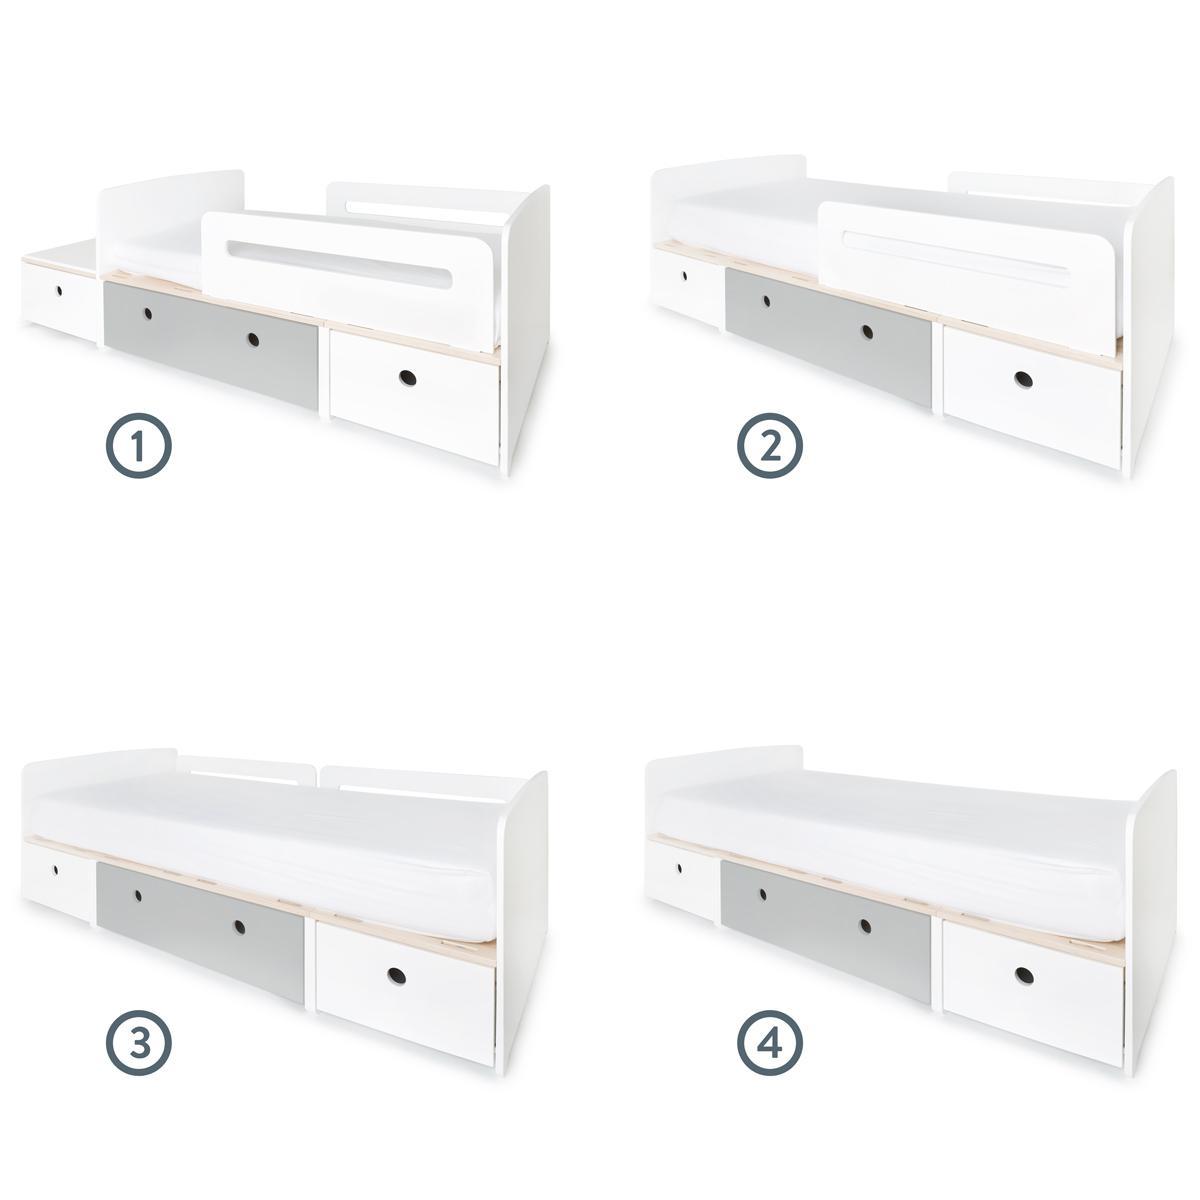 Kinderbett 90x200cm COLORFLEX white-pearl grey-white